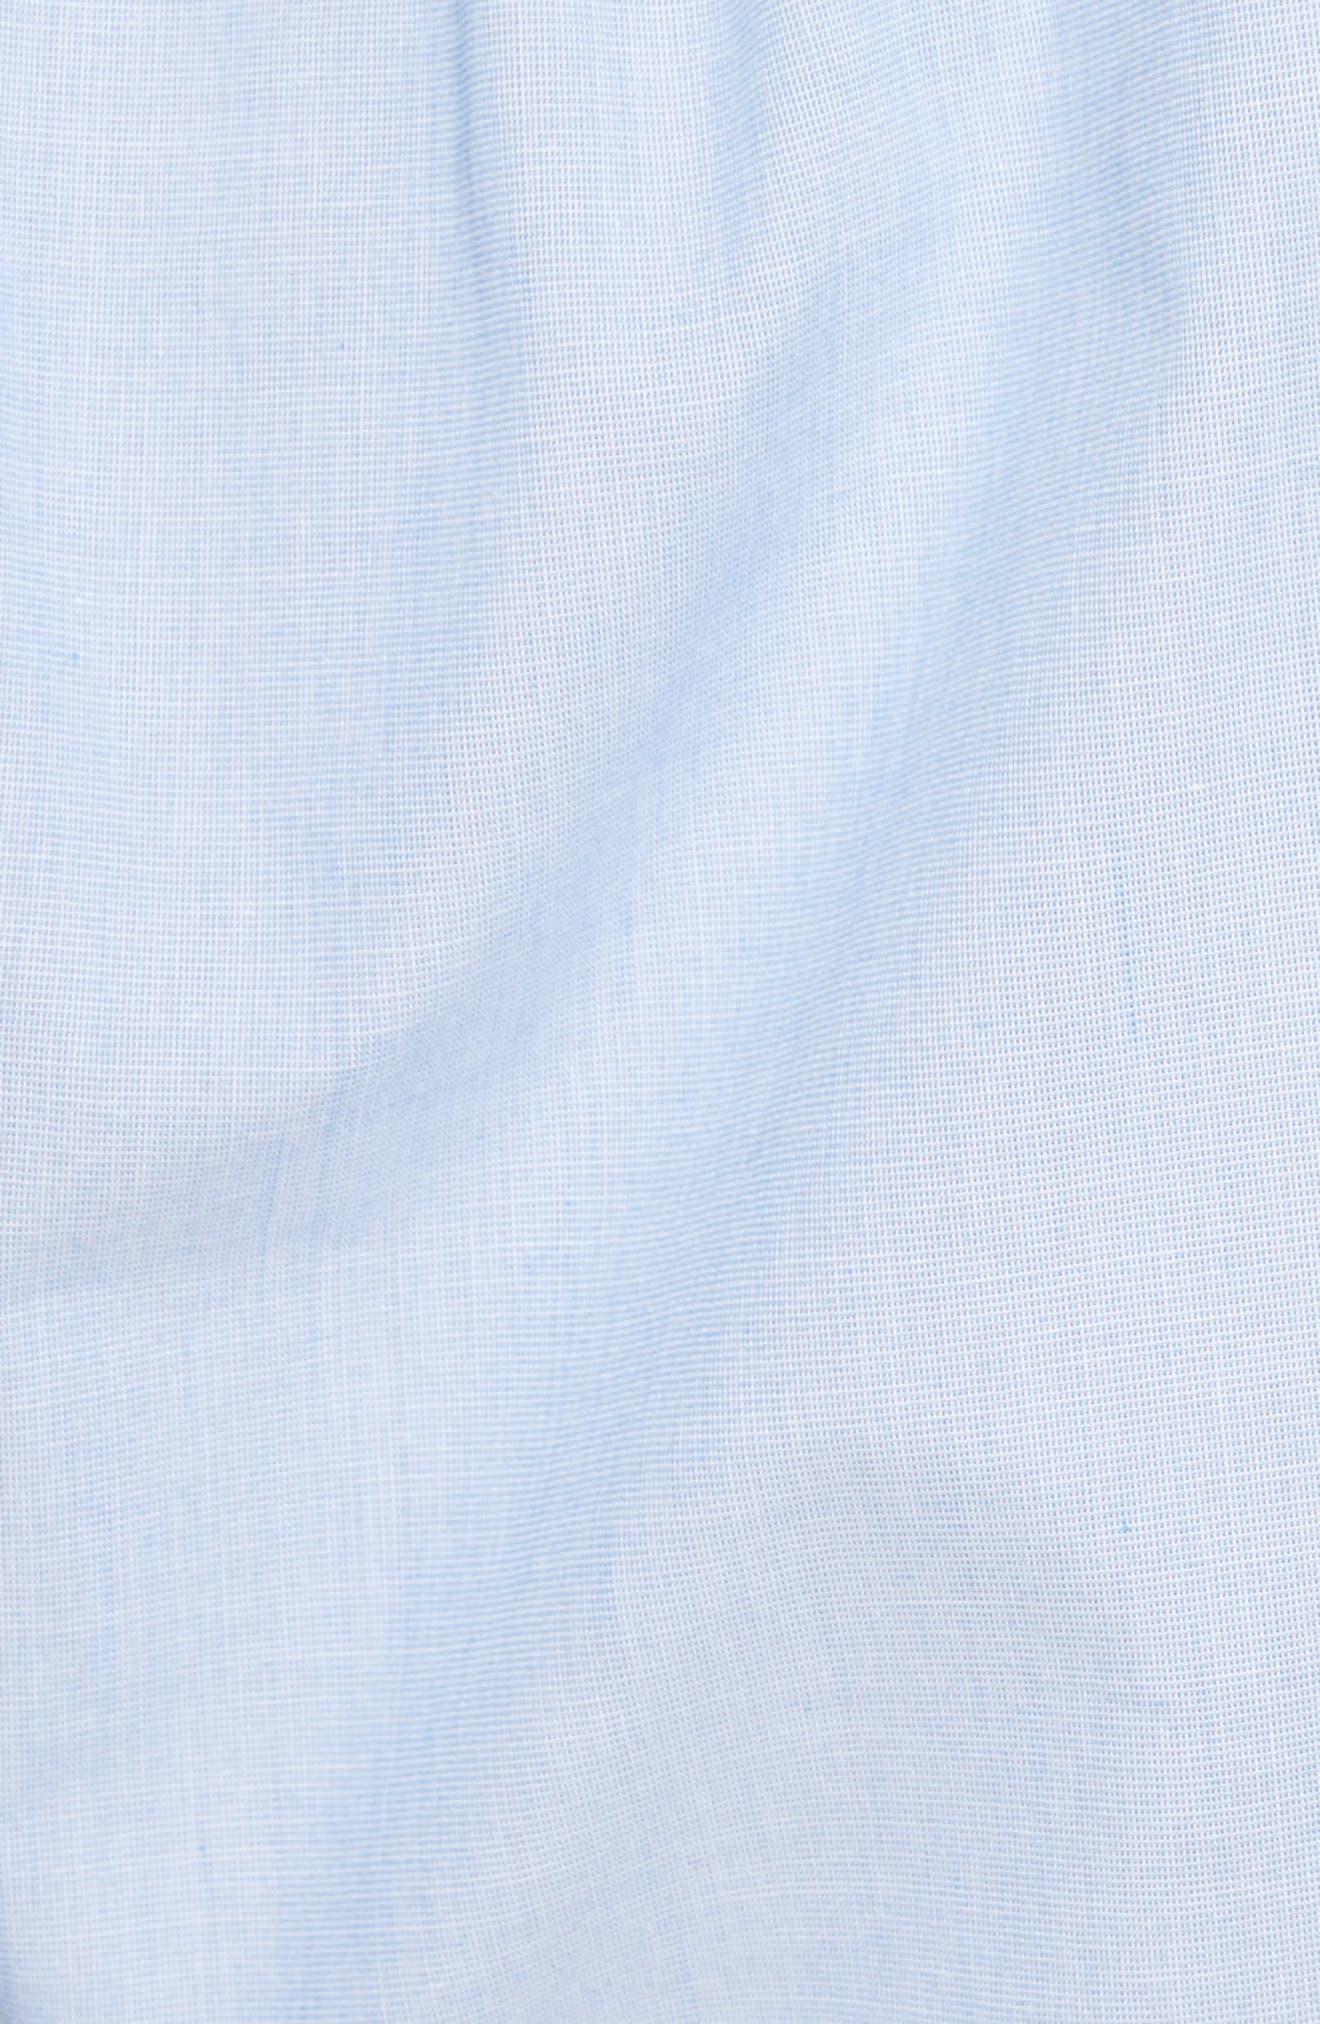 Azabeth Cotton Top,                             Alternate thumbnail 5, color,                             438